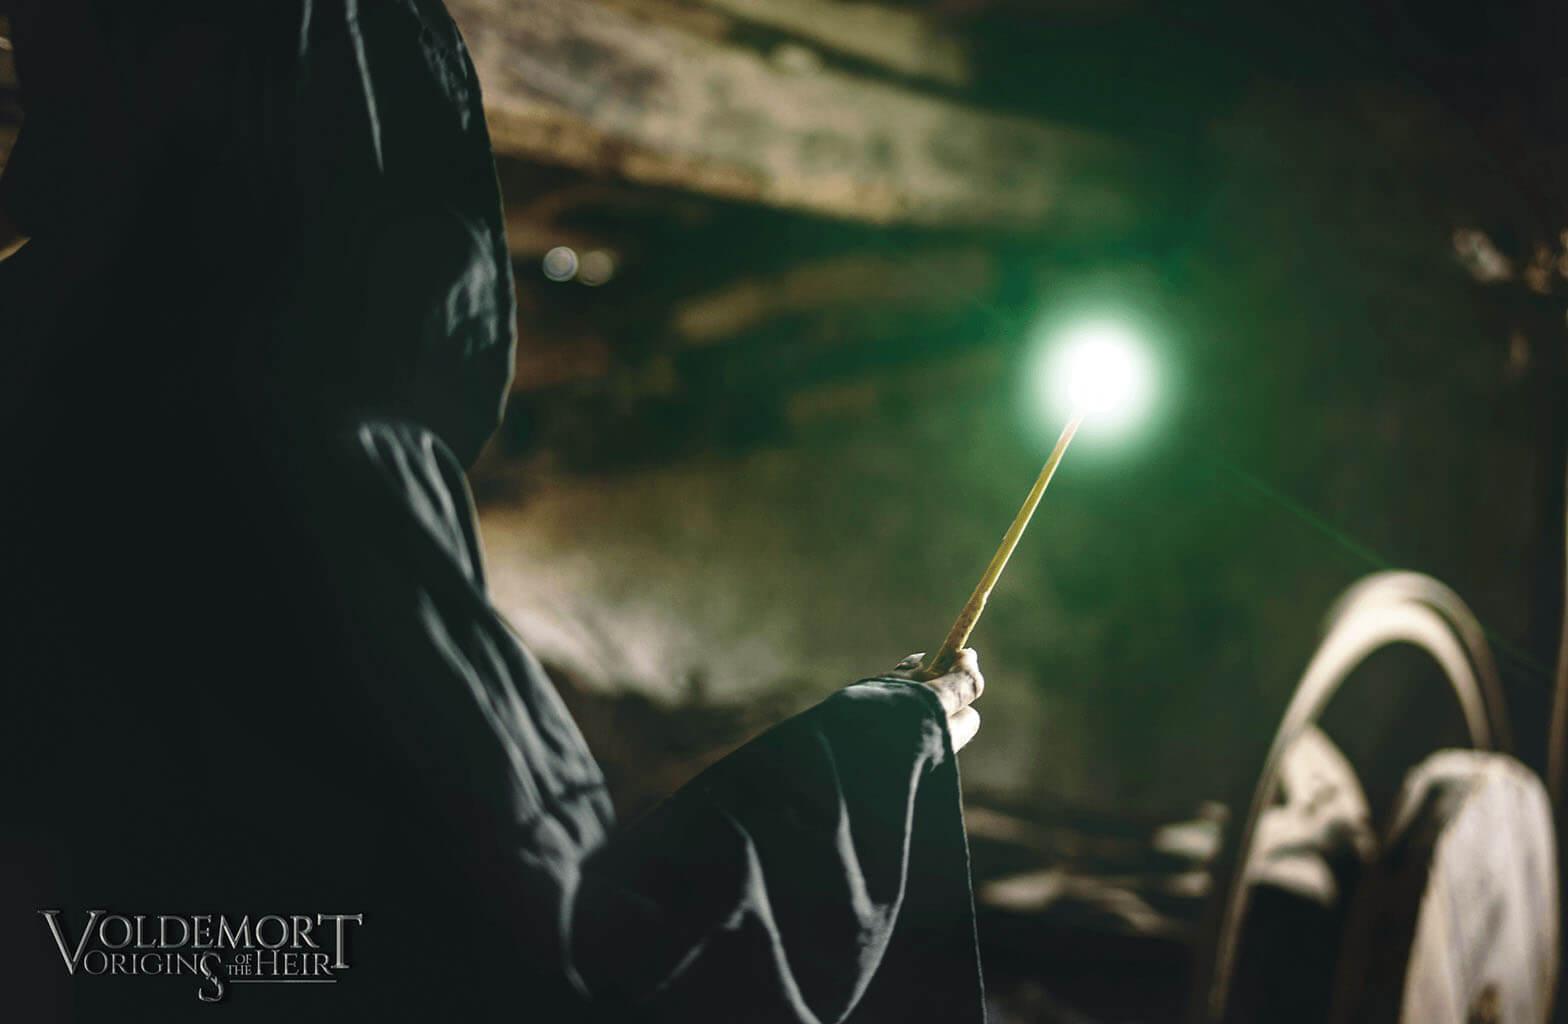 Voldemort, Origins of the Heir paralizó internet — El trailer